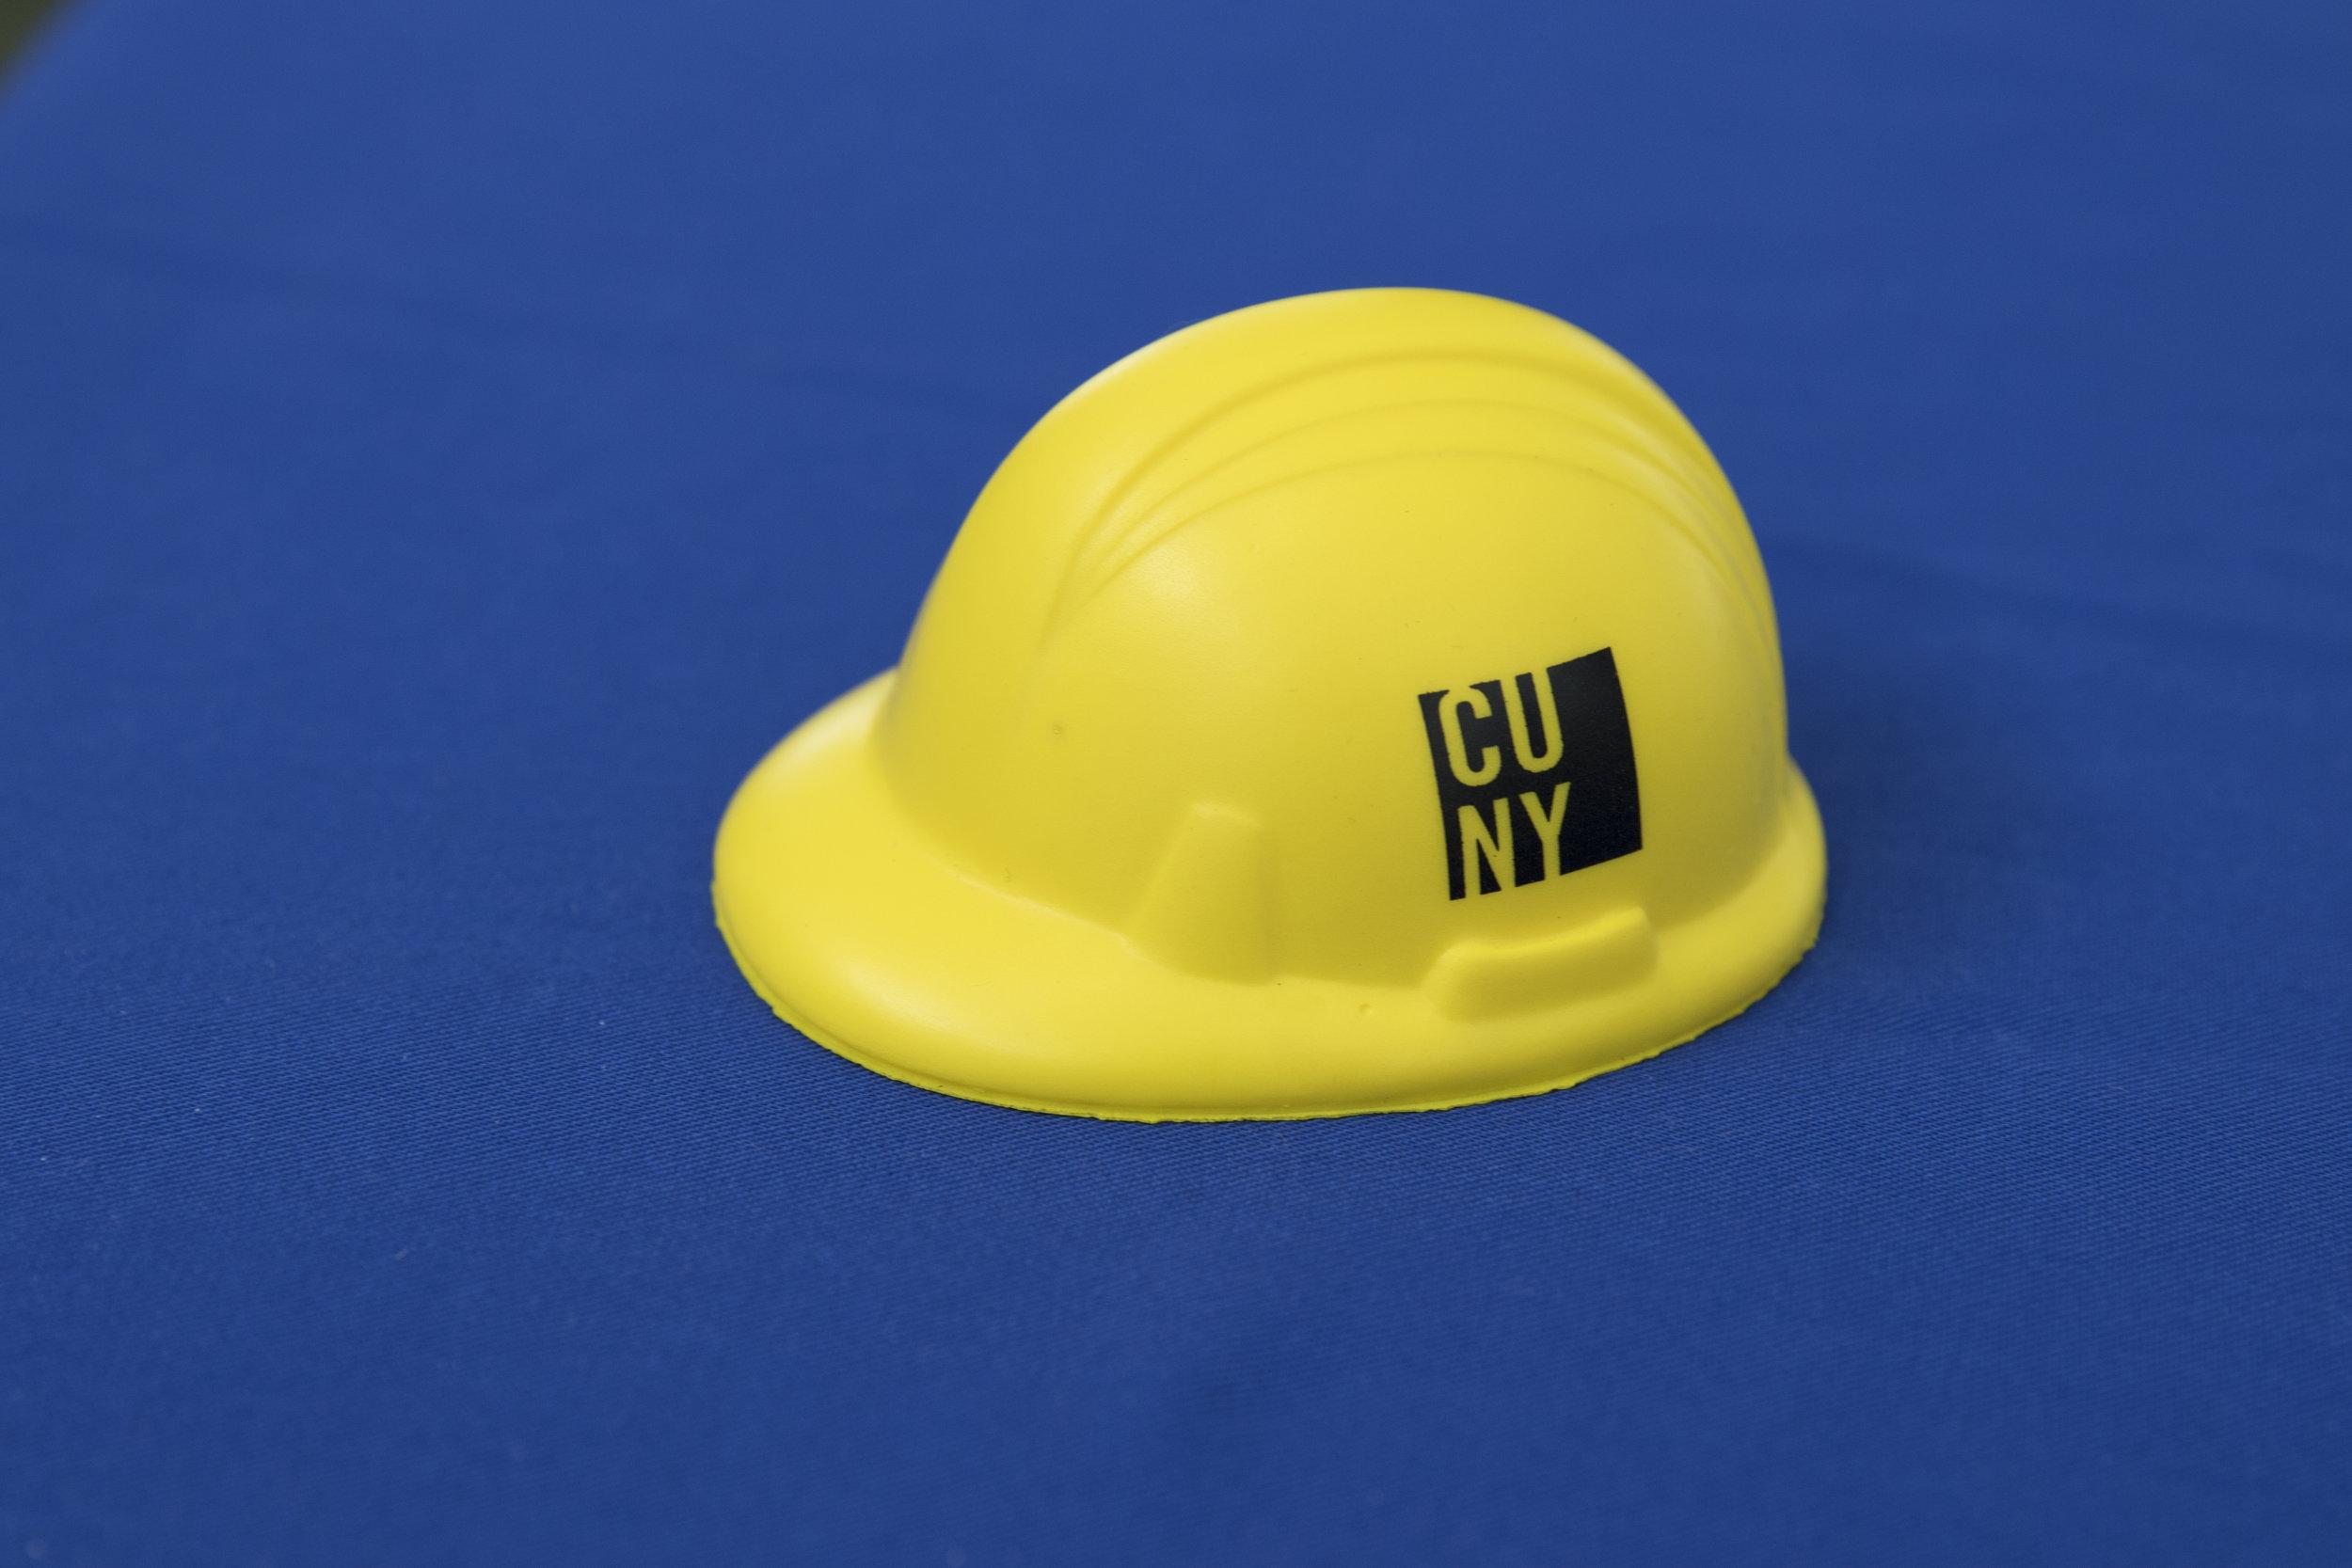 CUNY stress helmet